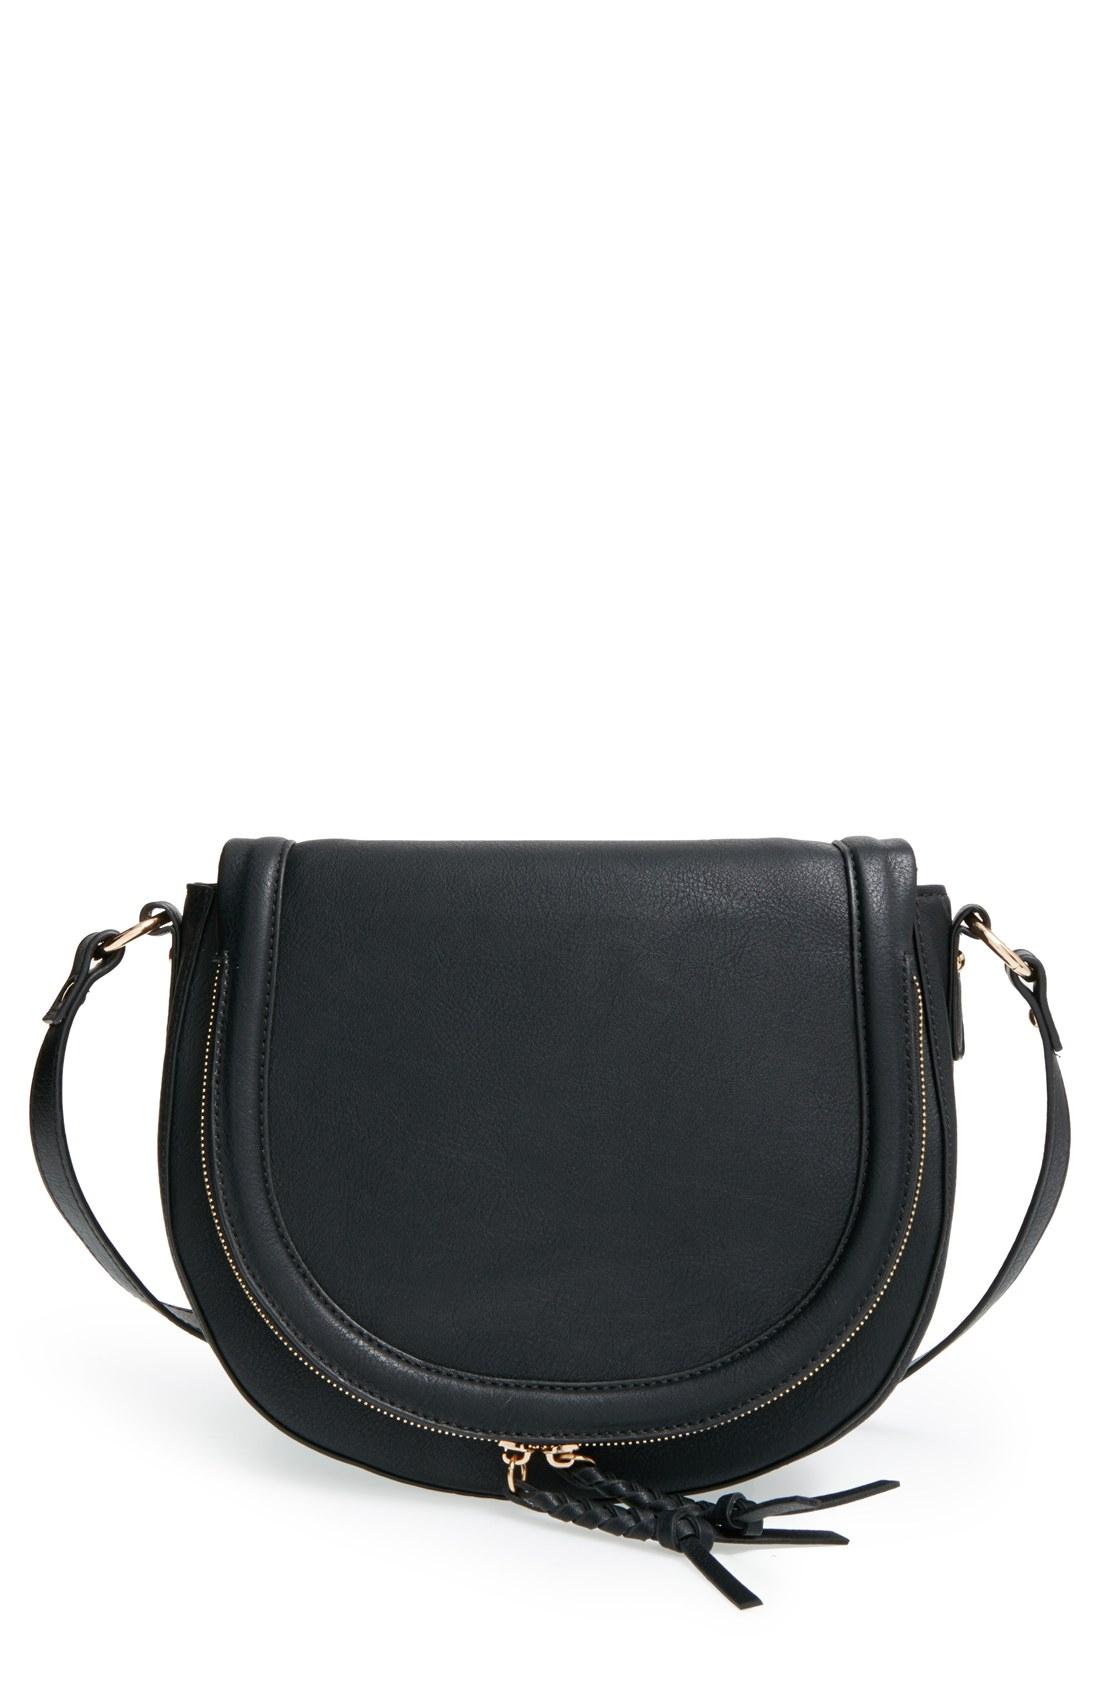 Sole Society  Thalia  Faux Leather Crossbody Bag  aec1d0043ee07